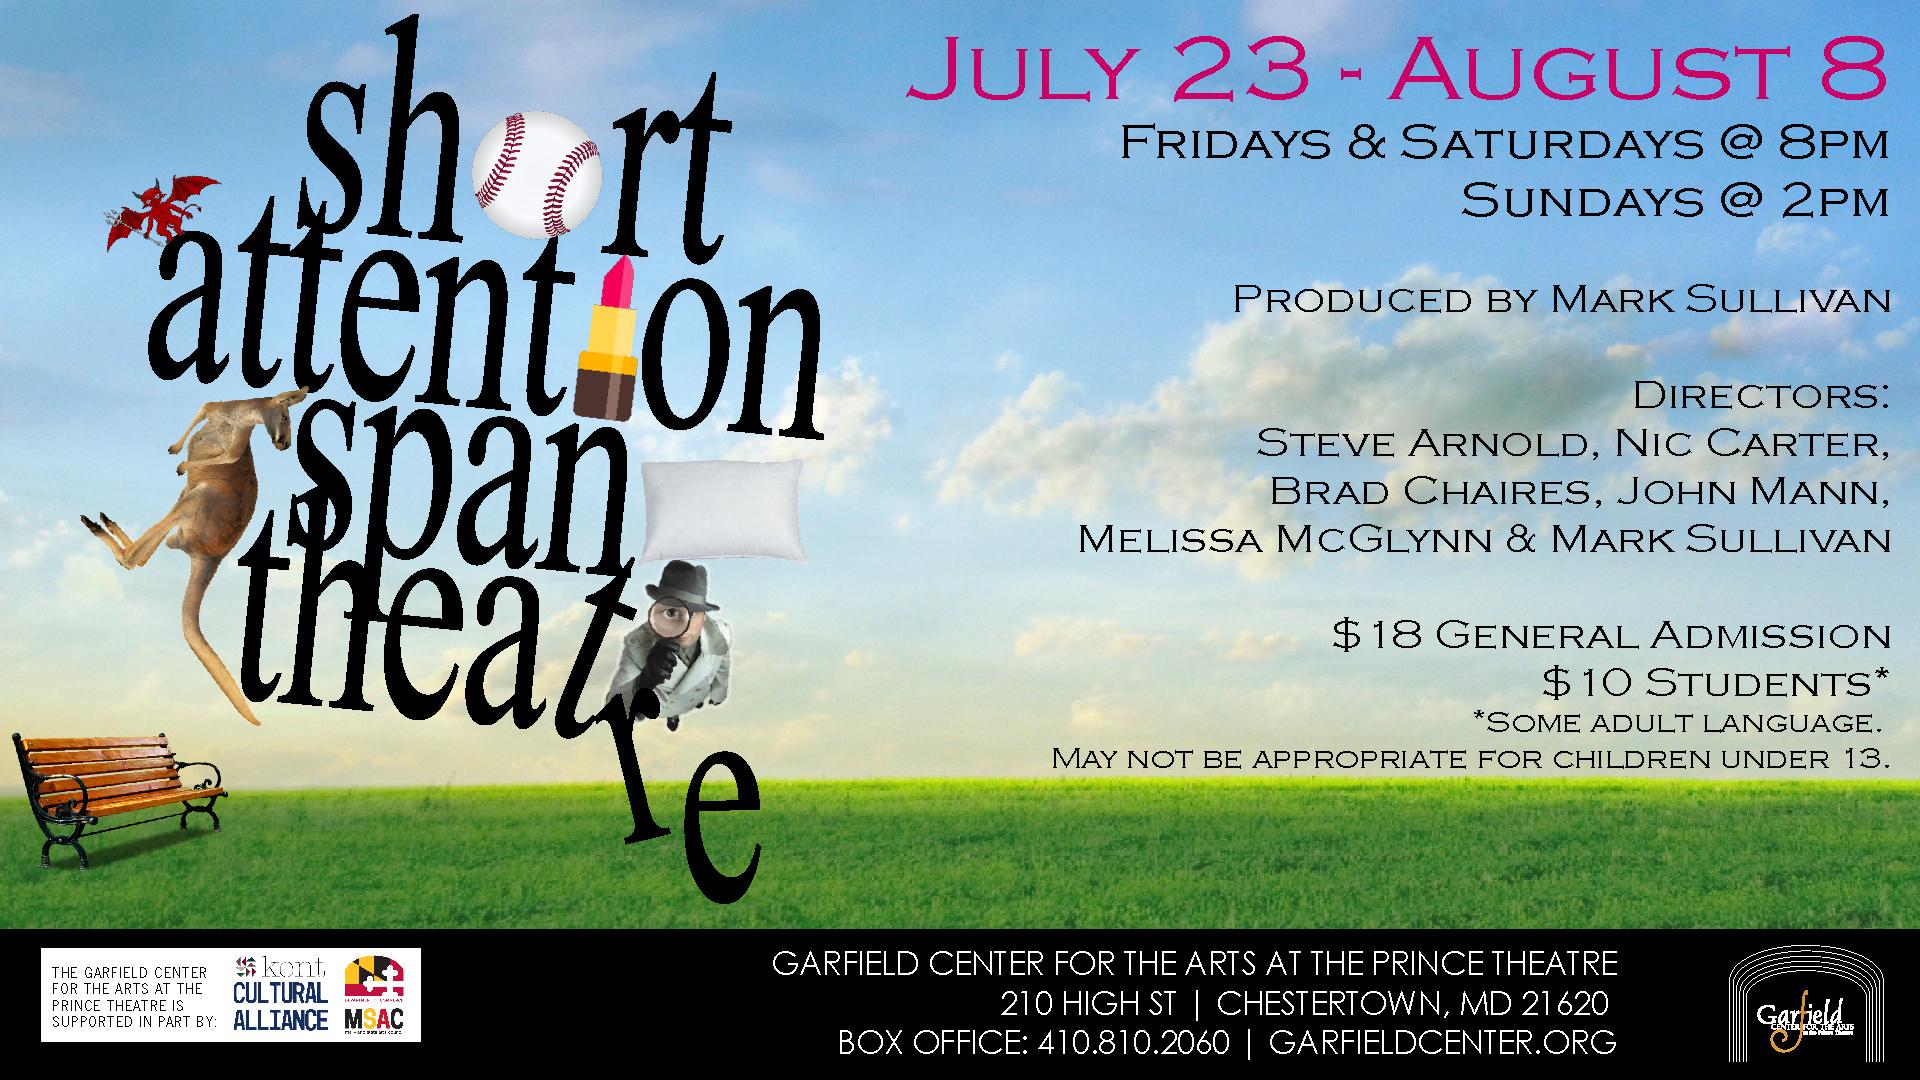 The Garfield Center presents Short Attention Span Theatre